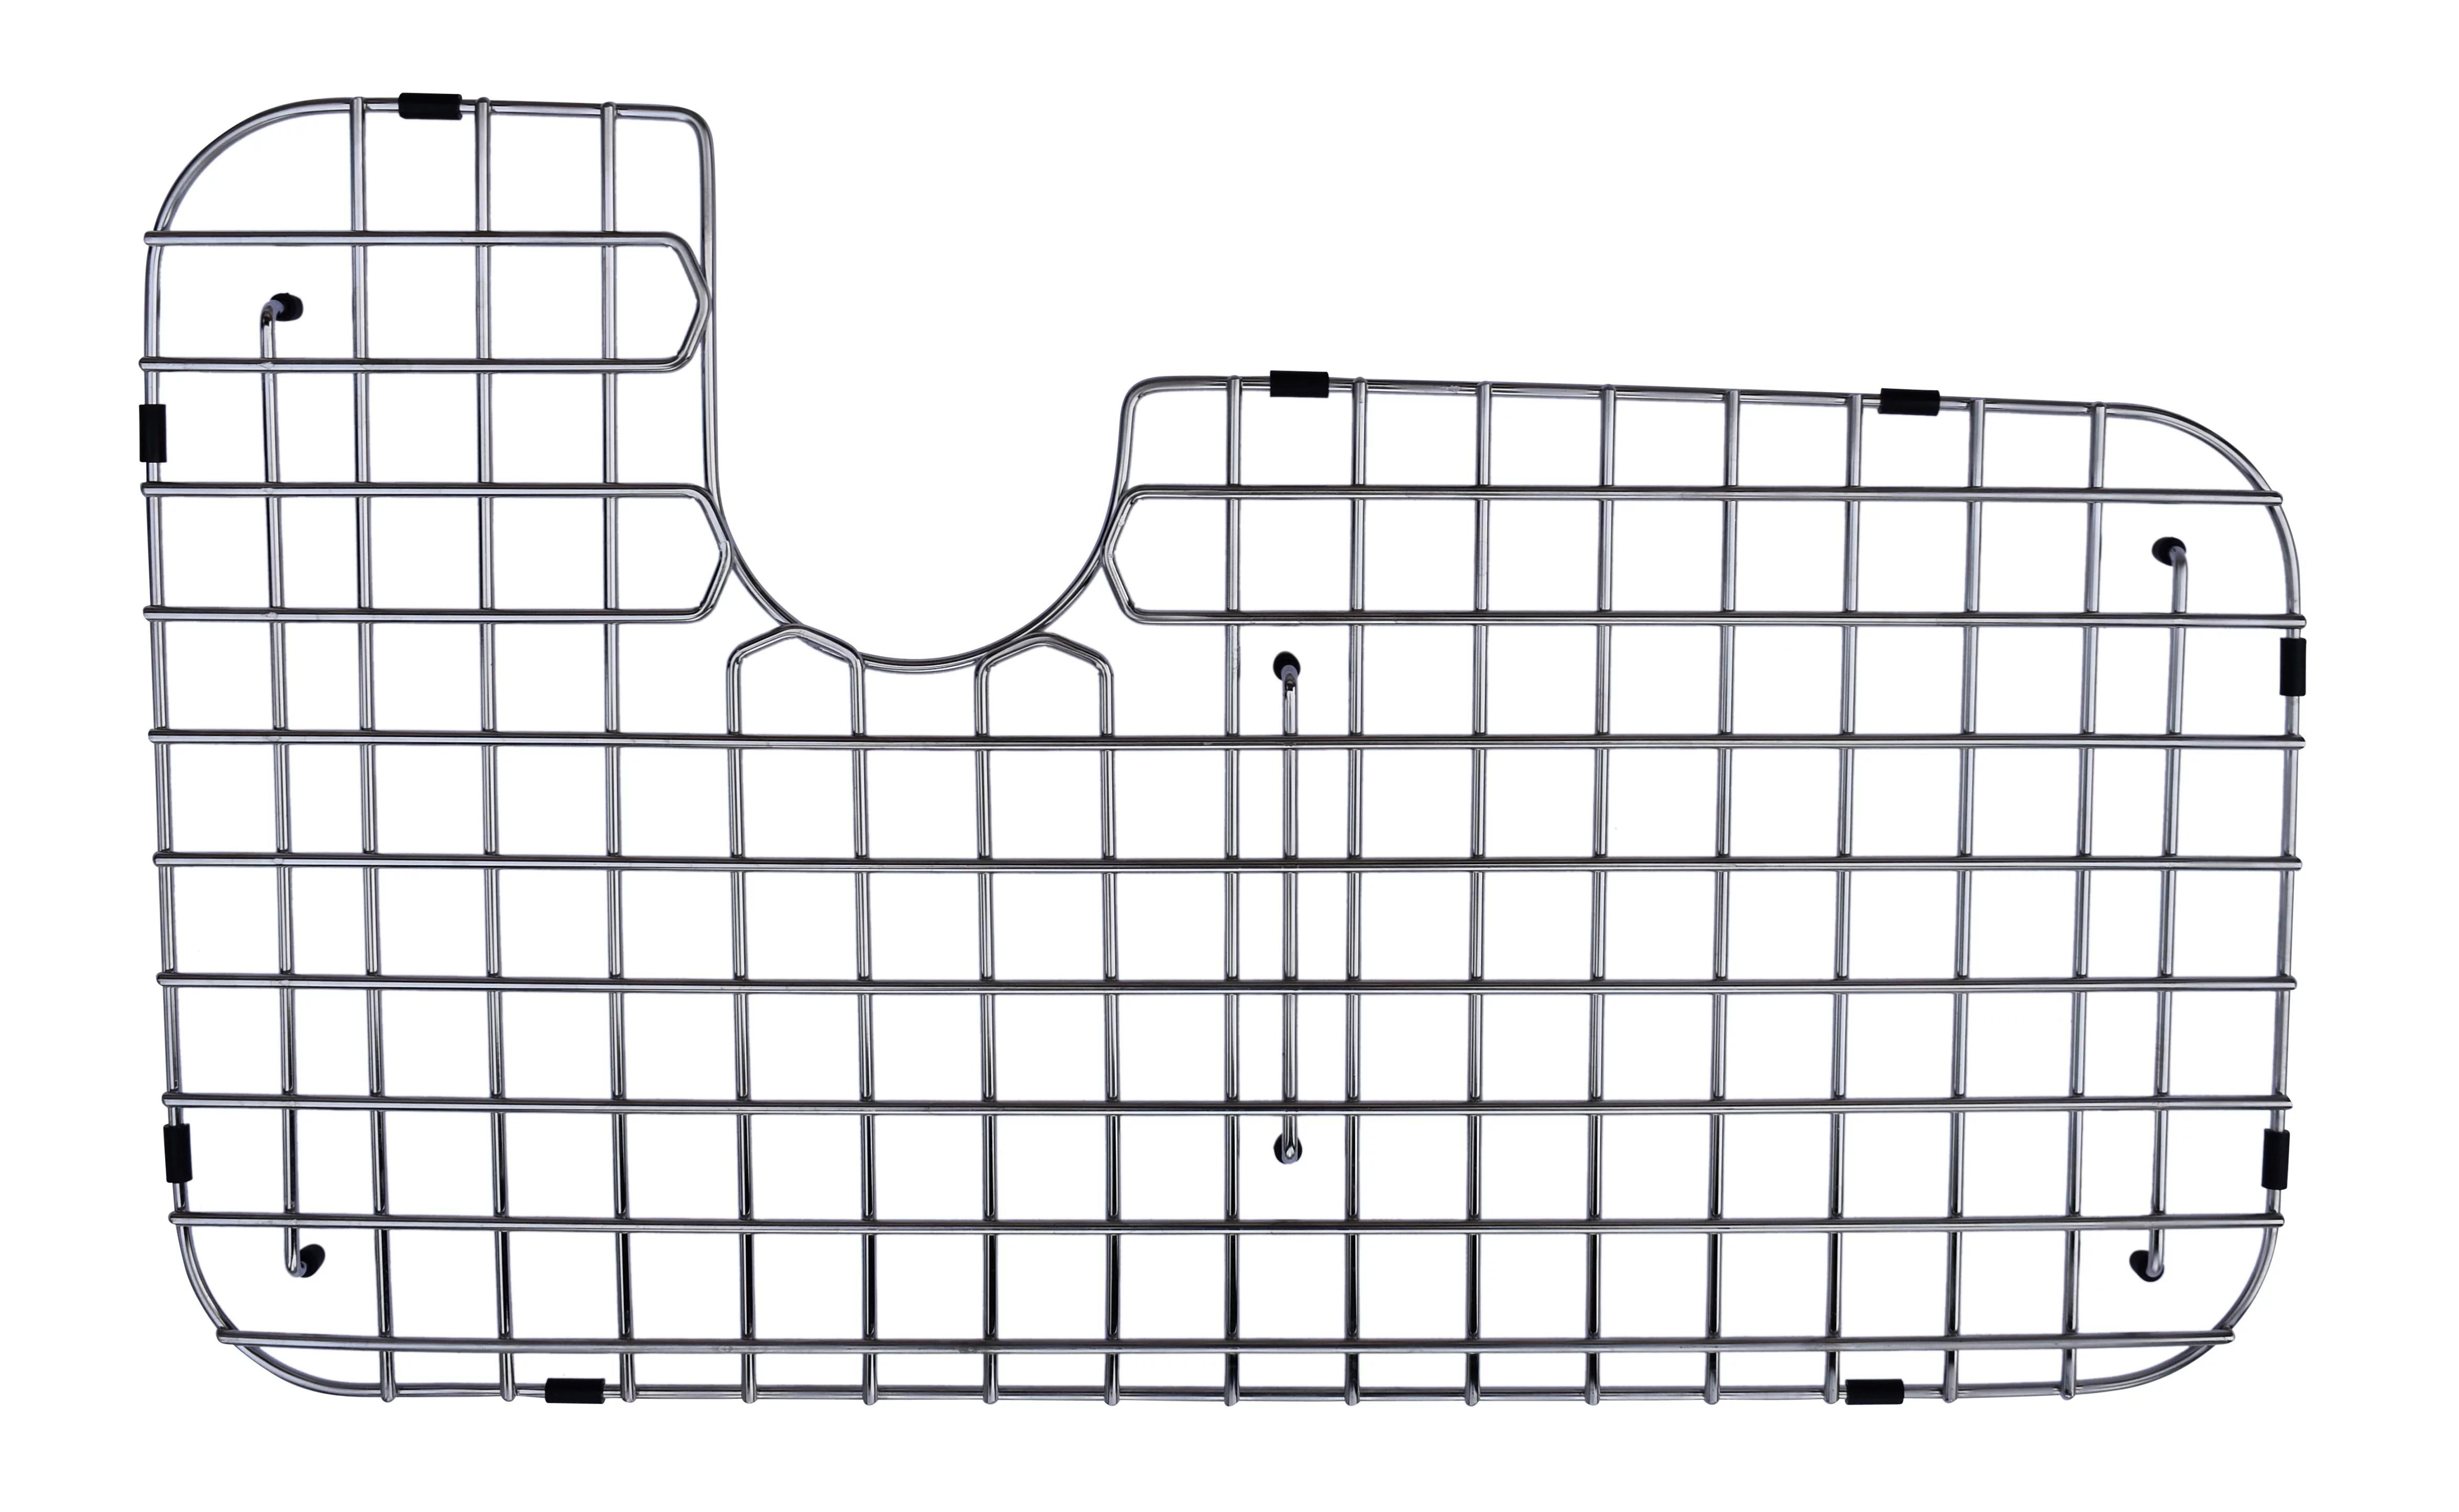 franke oc 36s alternative stainless steel sink grid for orca sinks by gridwares walmart com